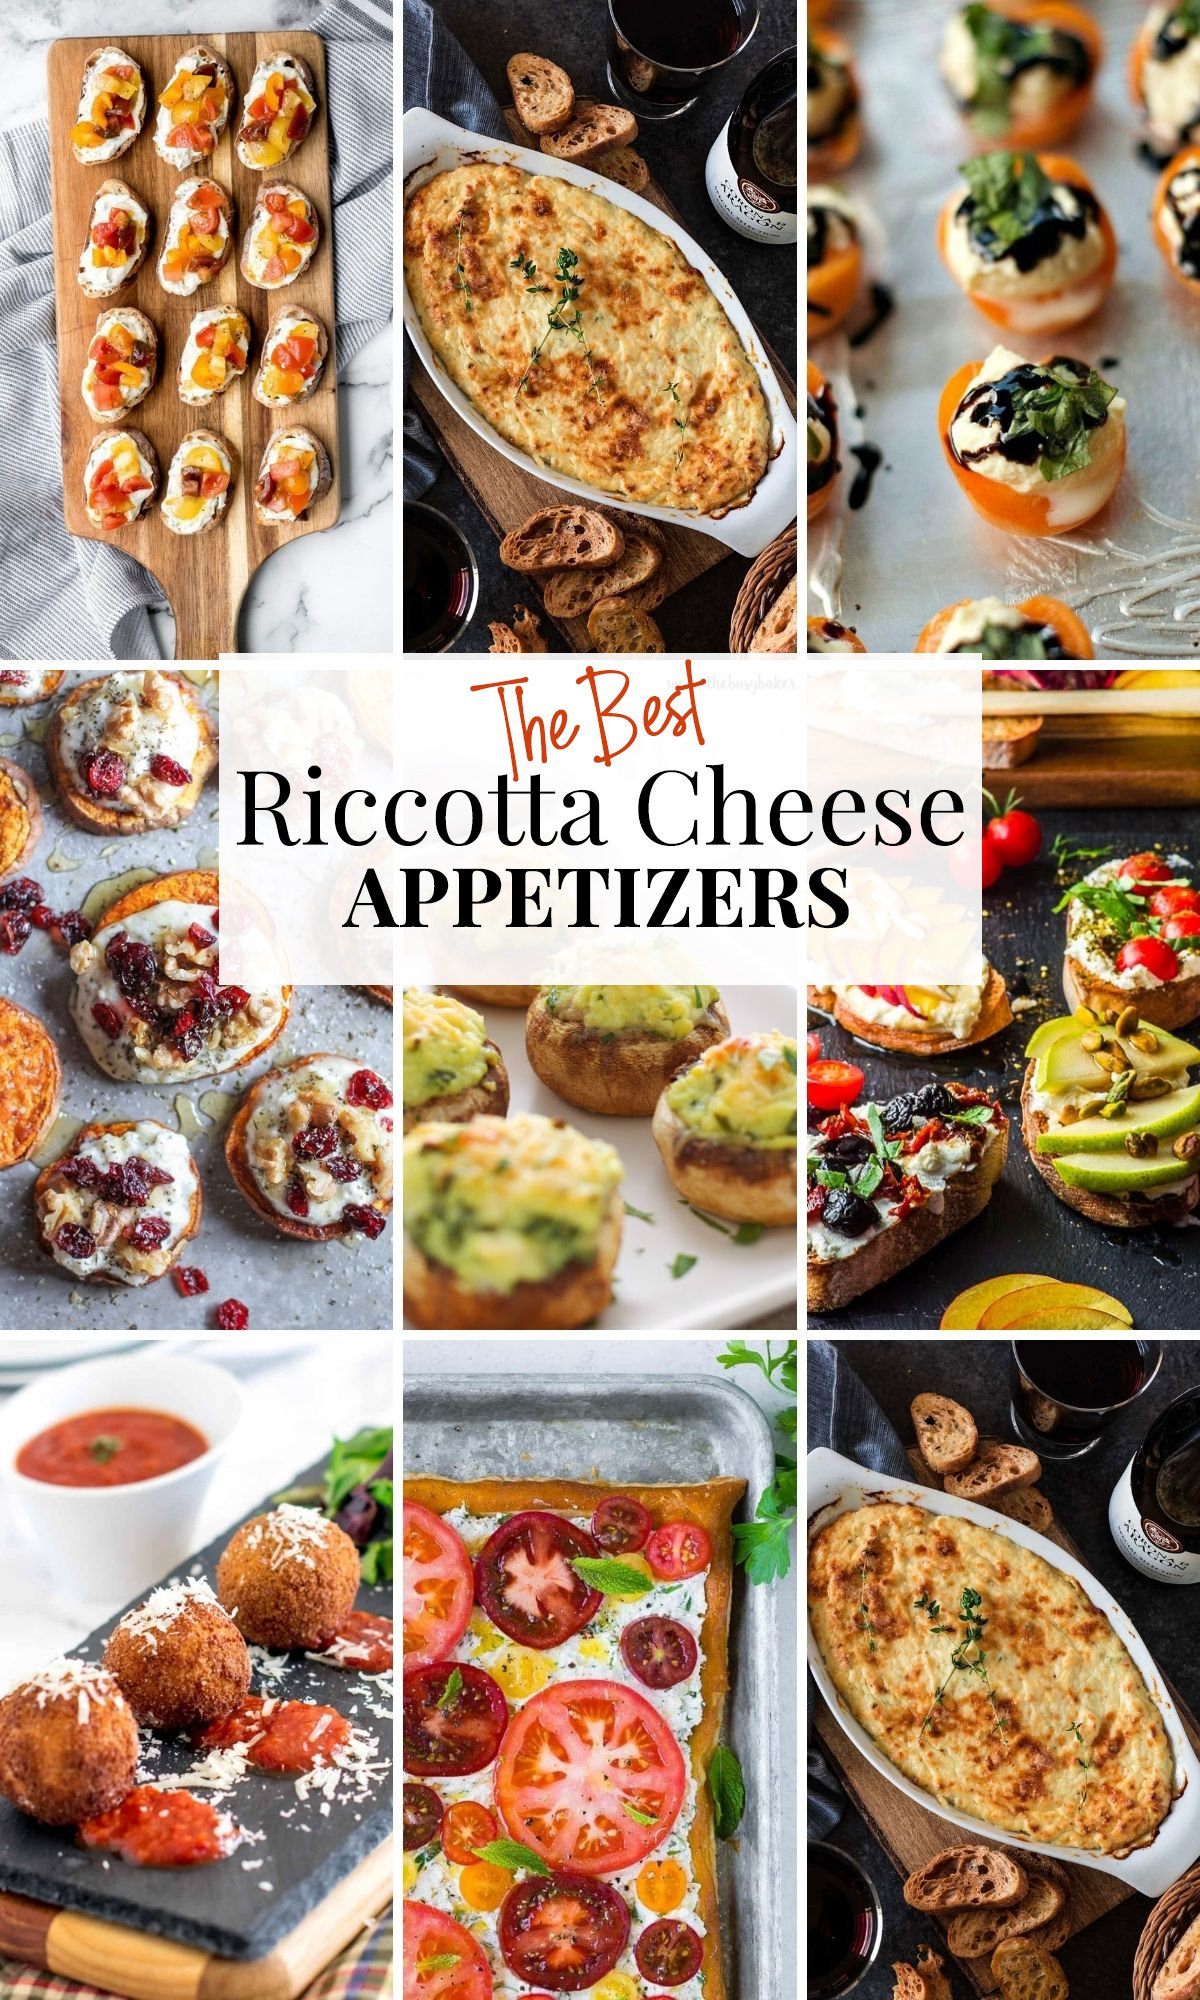 Ricotta Appetizers